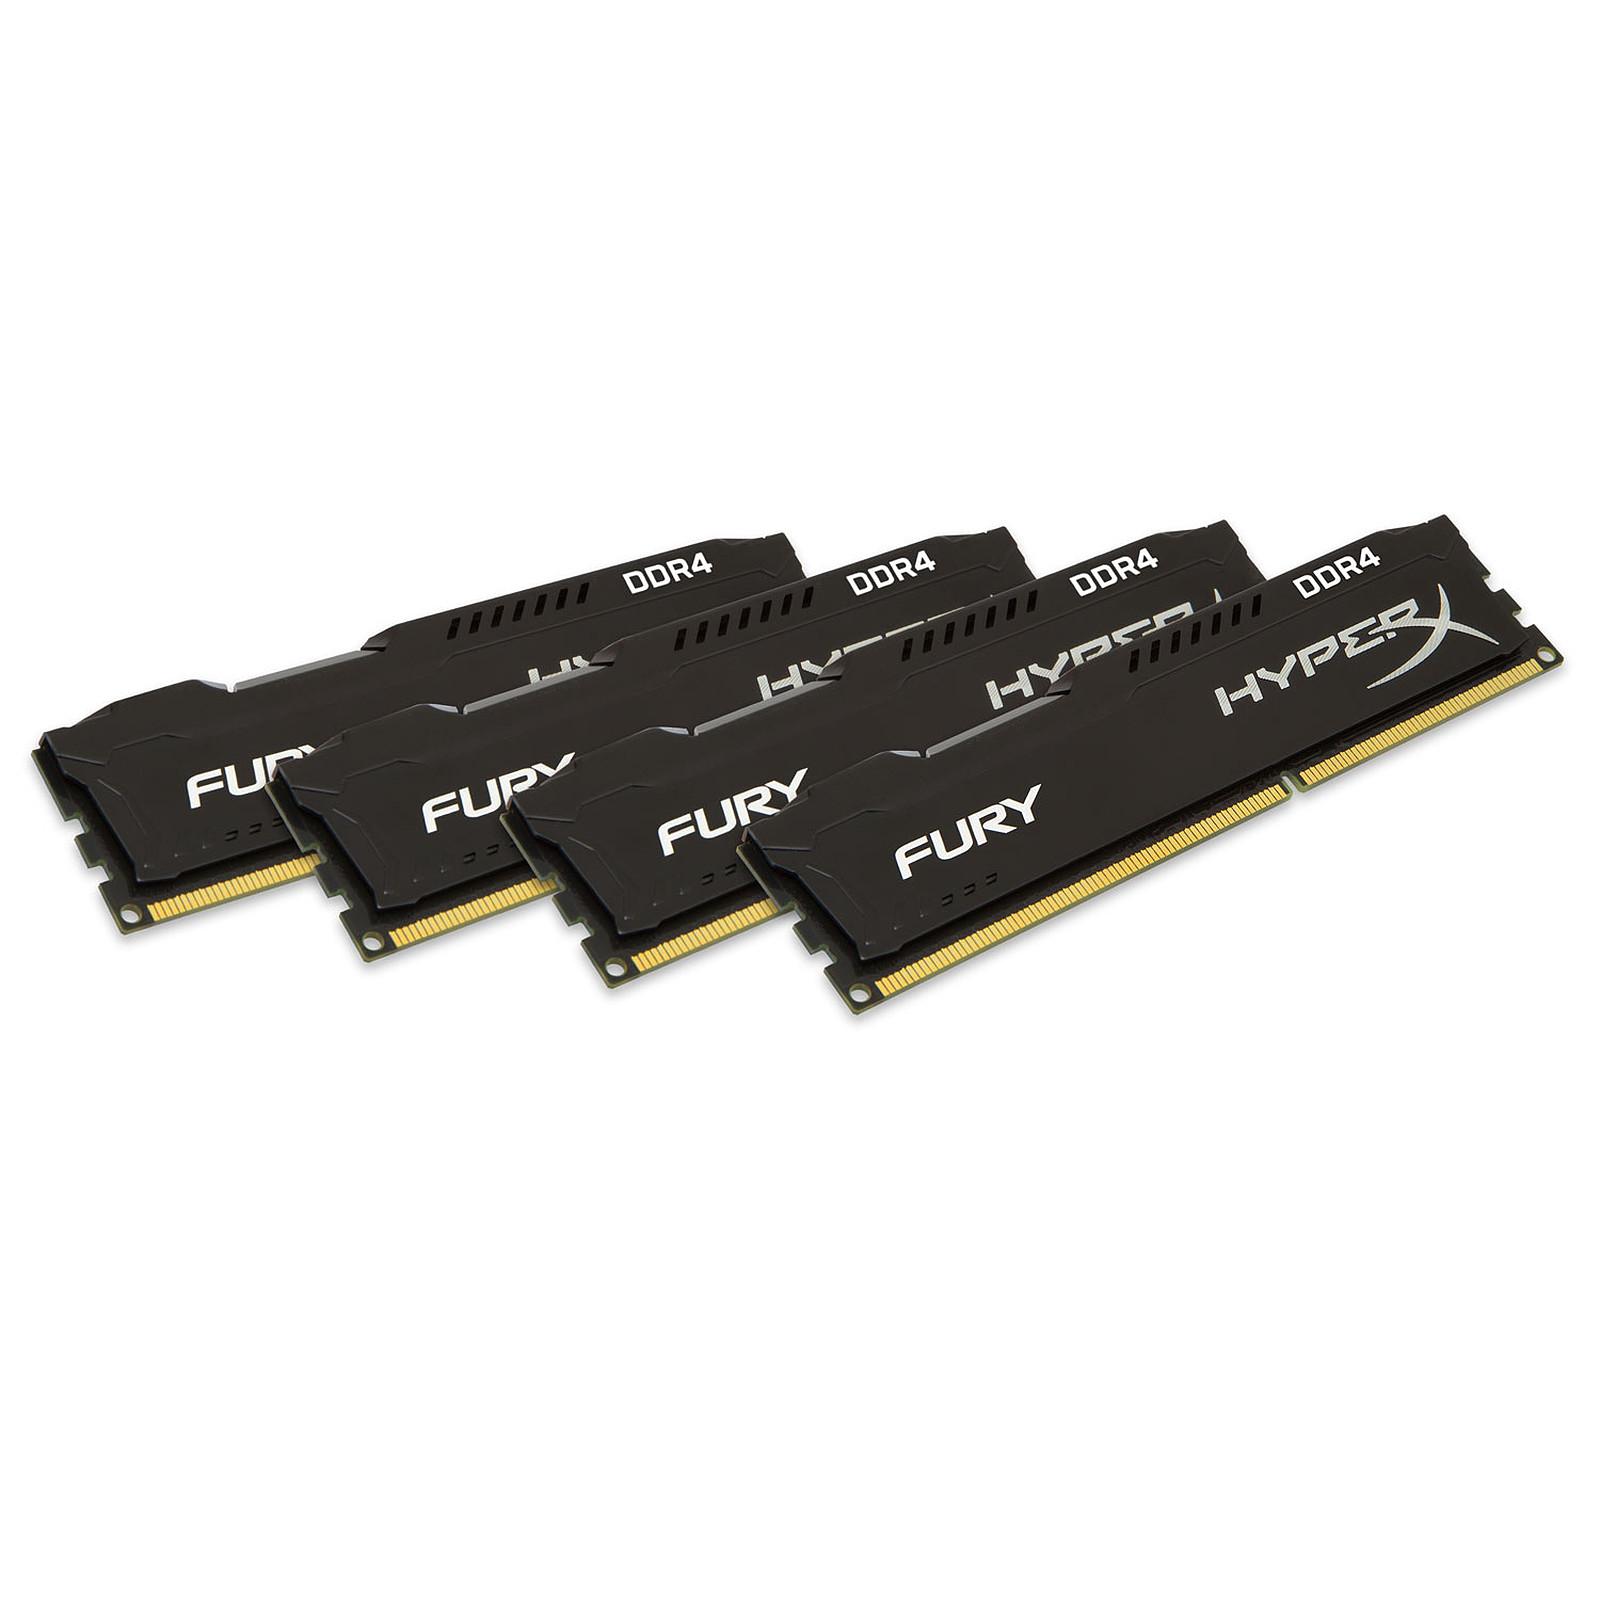 HyperX Fury Noir 64 Go (4x 16 Go) DDR4 2933 MHz CL17